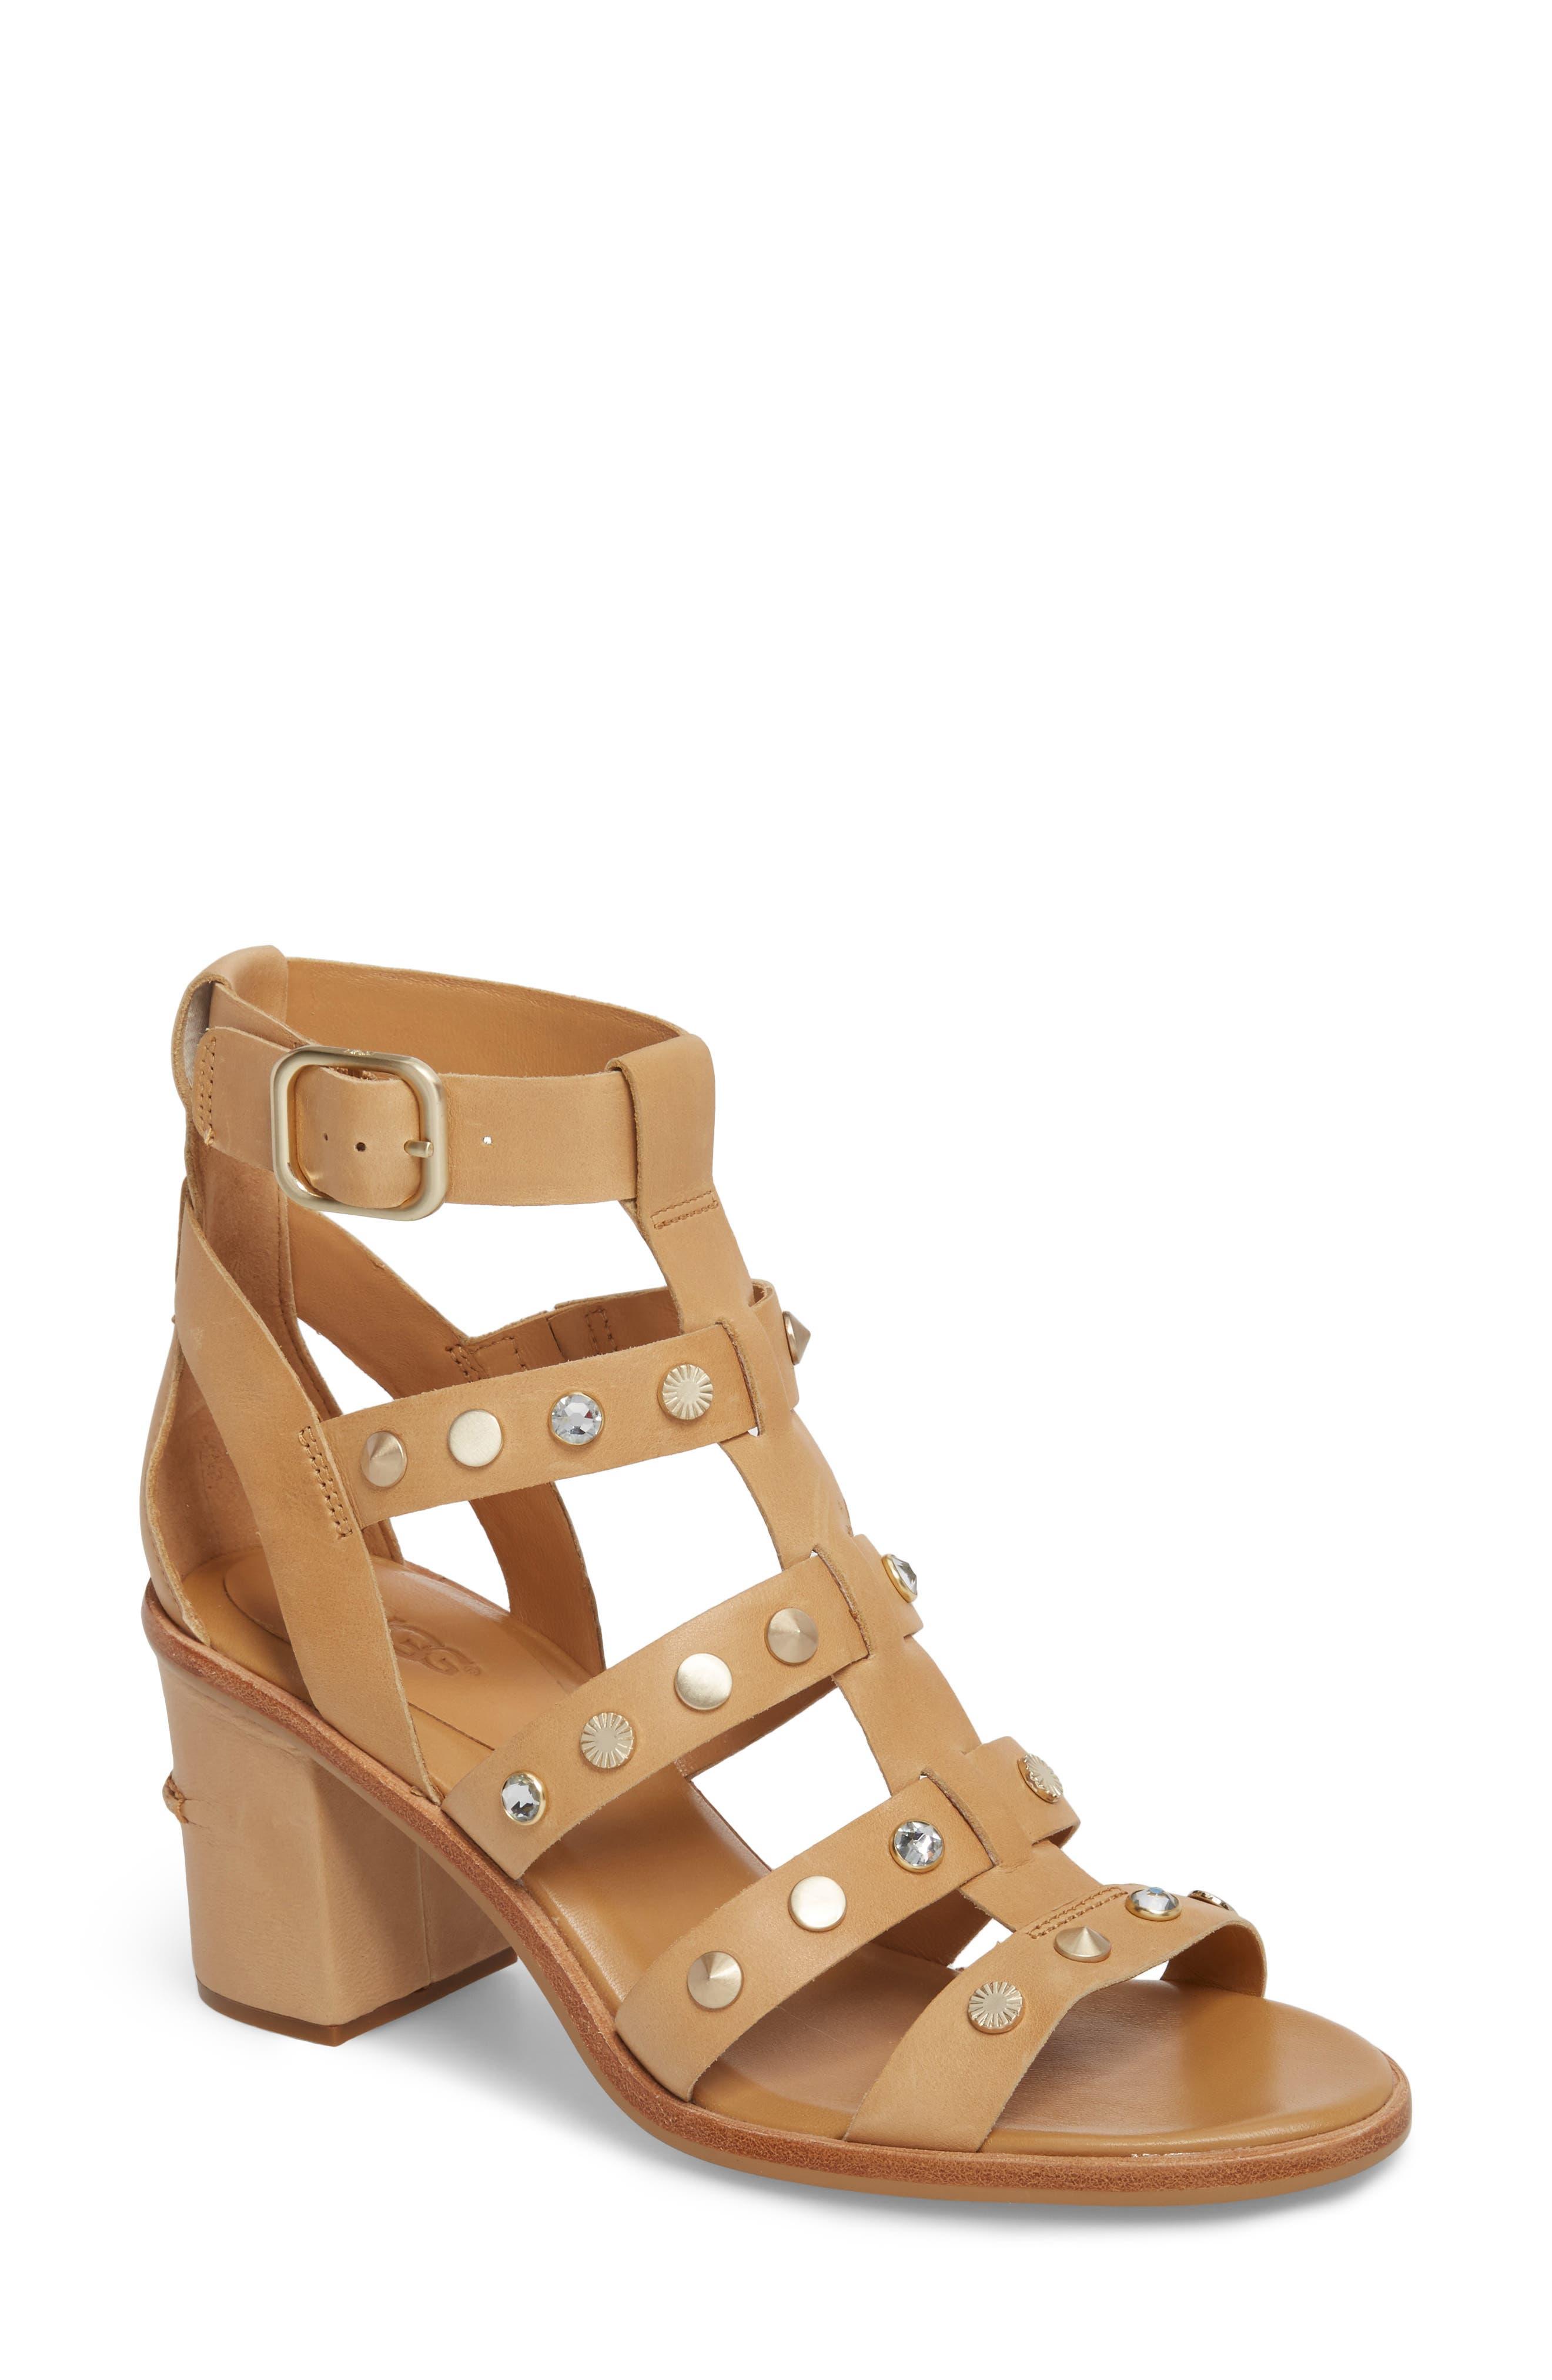 Macayla Studded Sandal,                         Main,                         color, Latte Suede